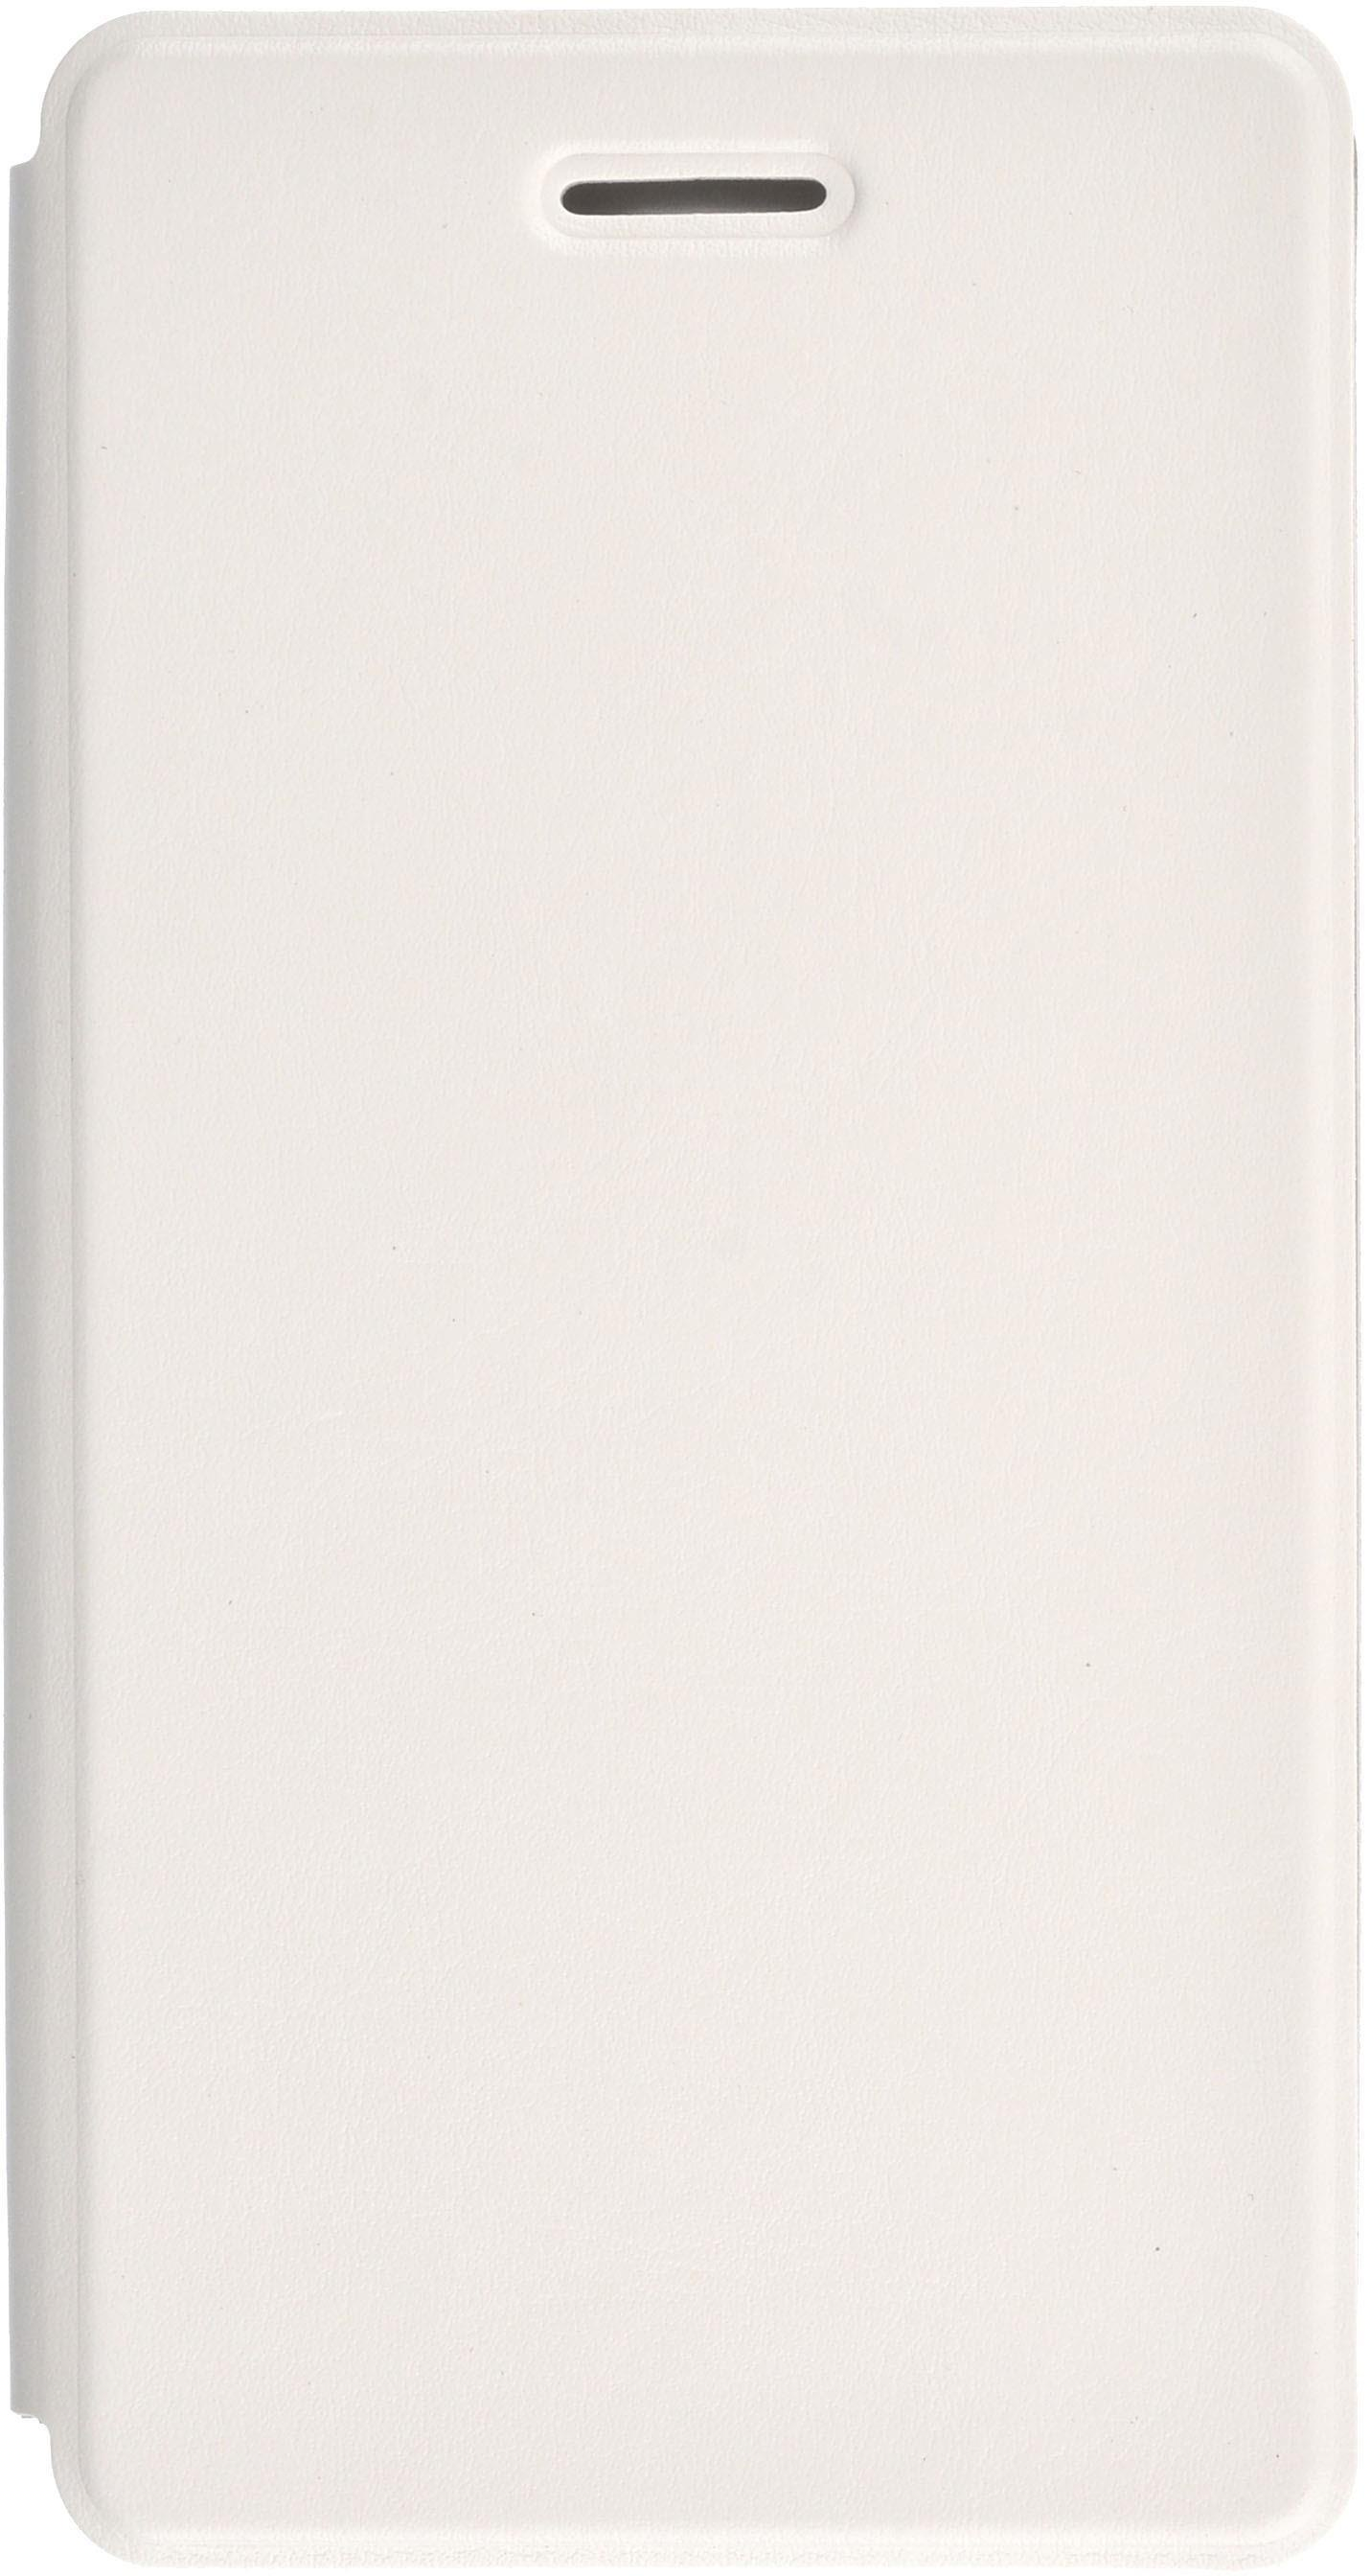 Чехол для сотового телефона skinBOX Lux, 4630042527669, белый nokia cc 3096 чехол для lumia 435 532 bright orange